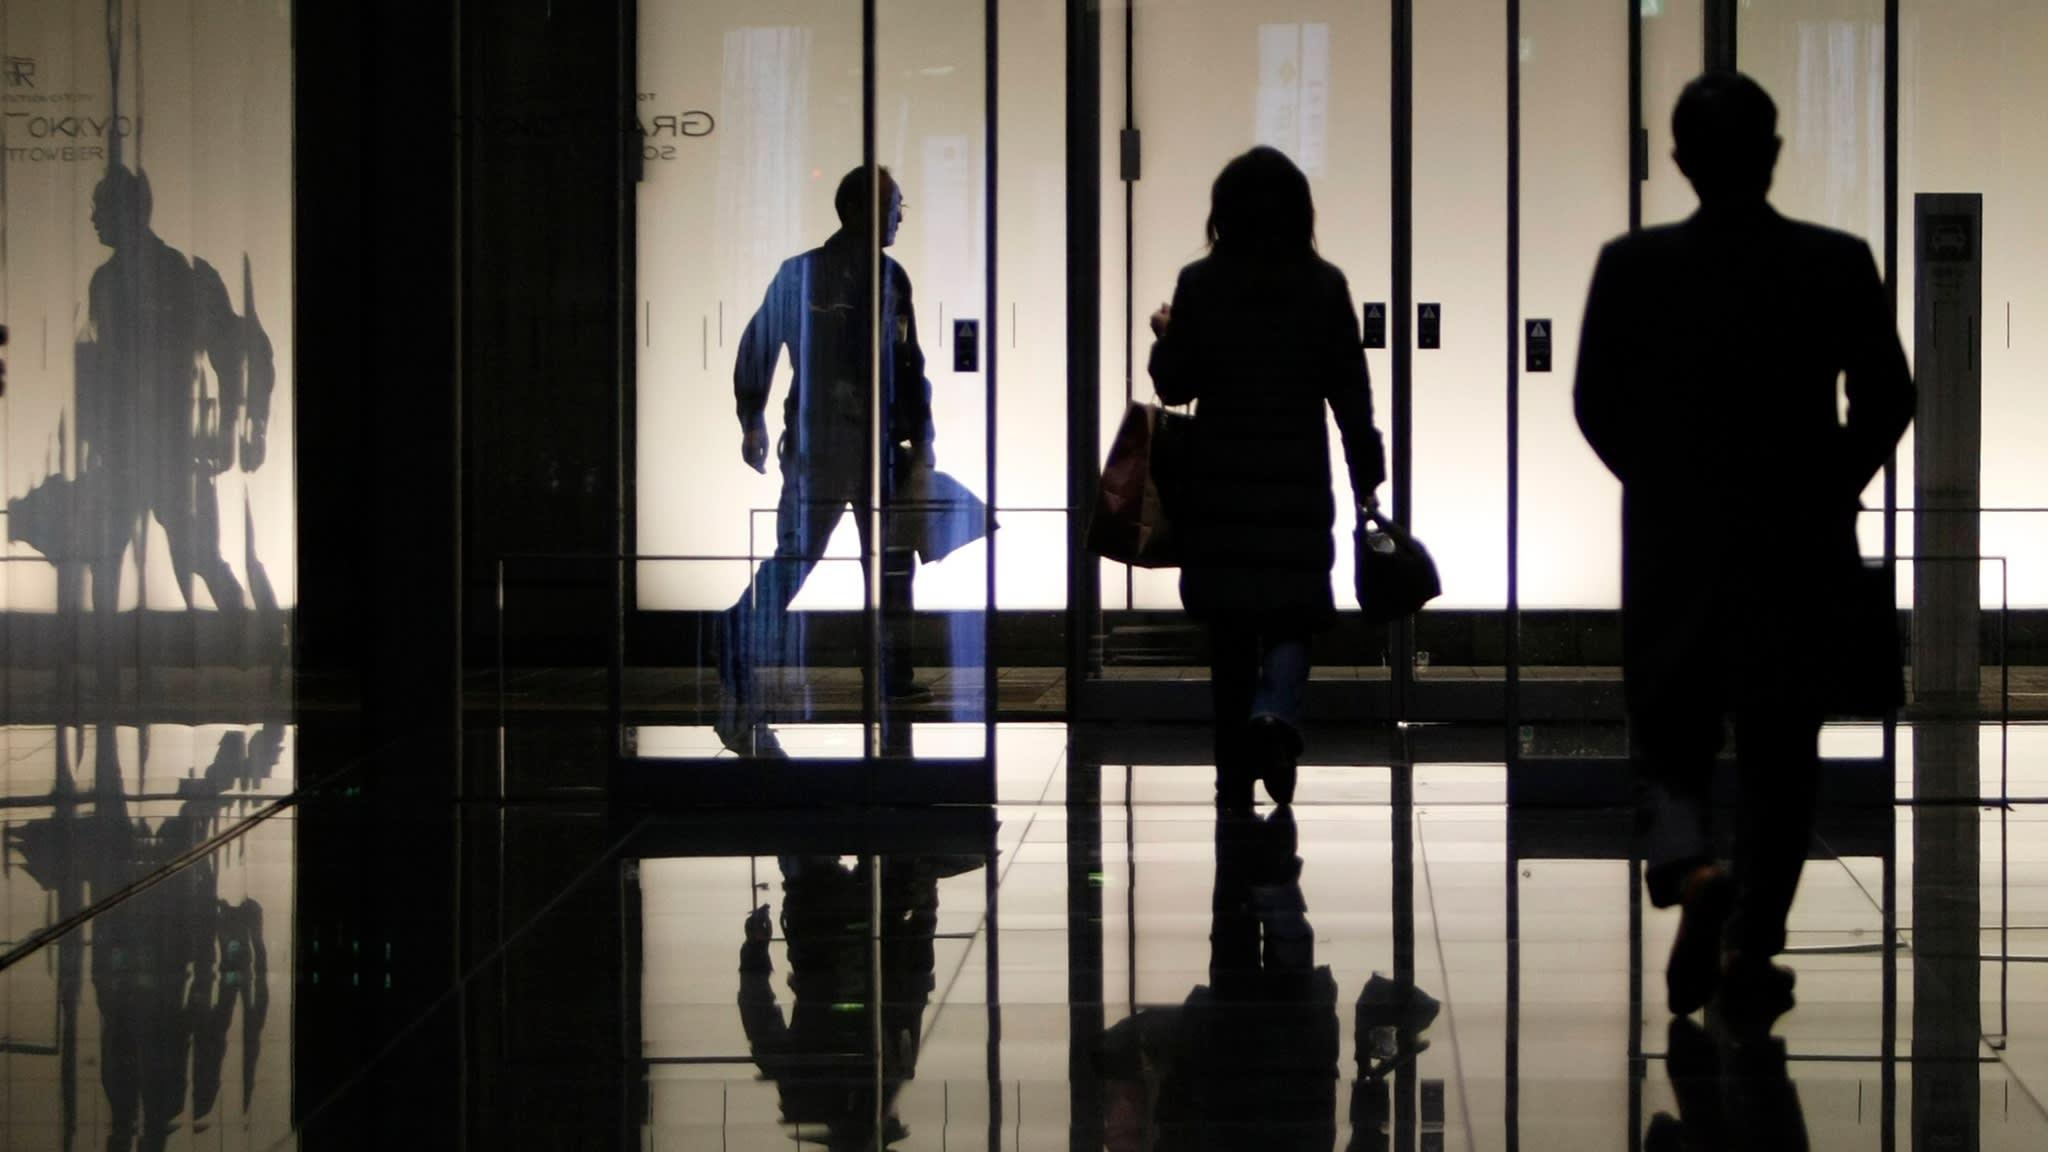 Nearly half of global workforce risk losing livelihoods in pandemic: ILO